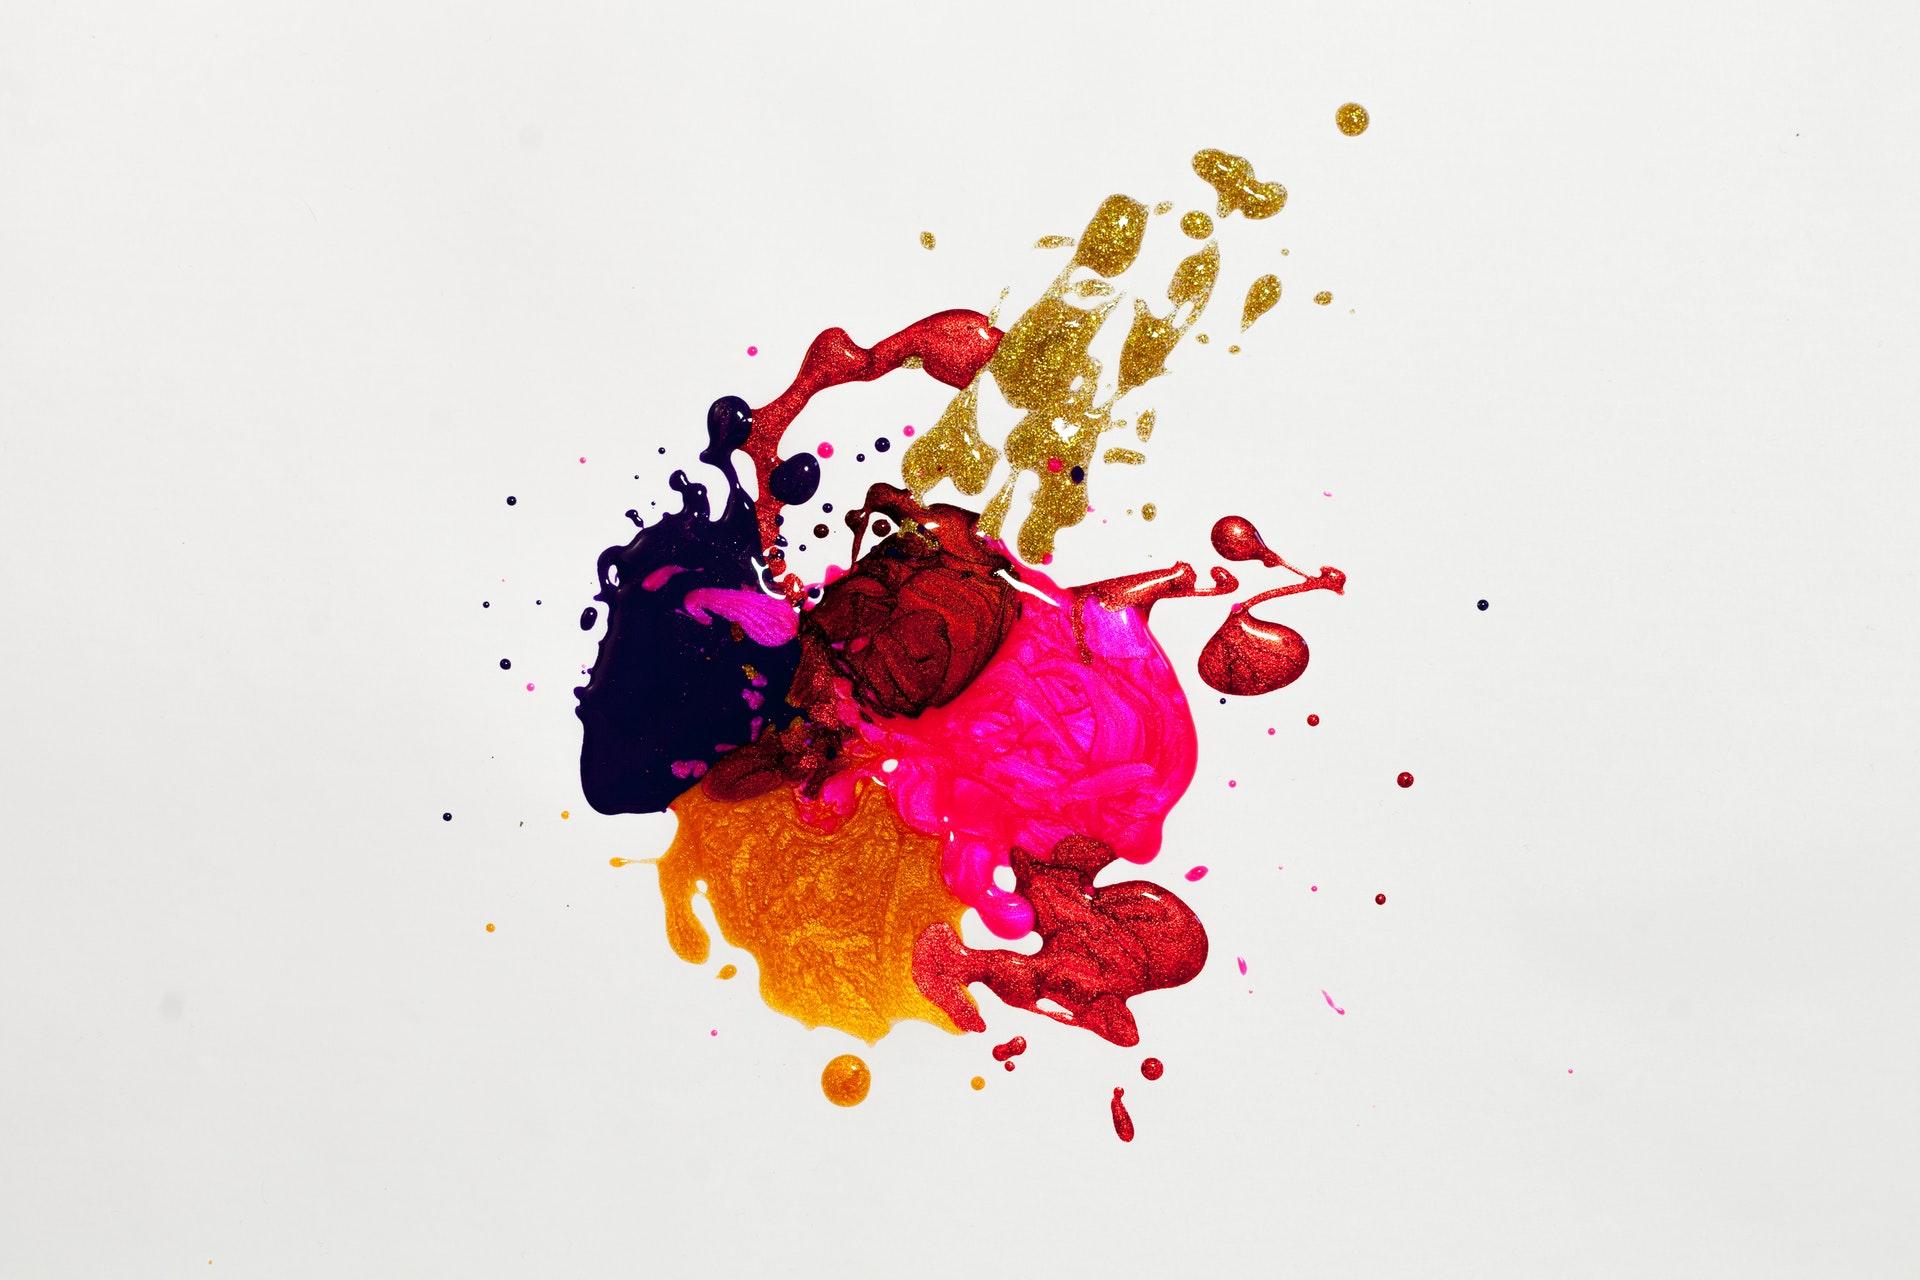 Blæk, maling, kreativ, sjov